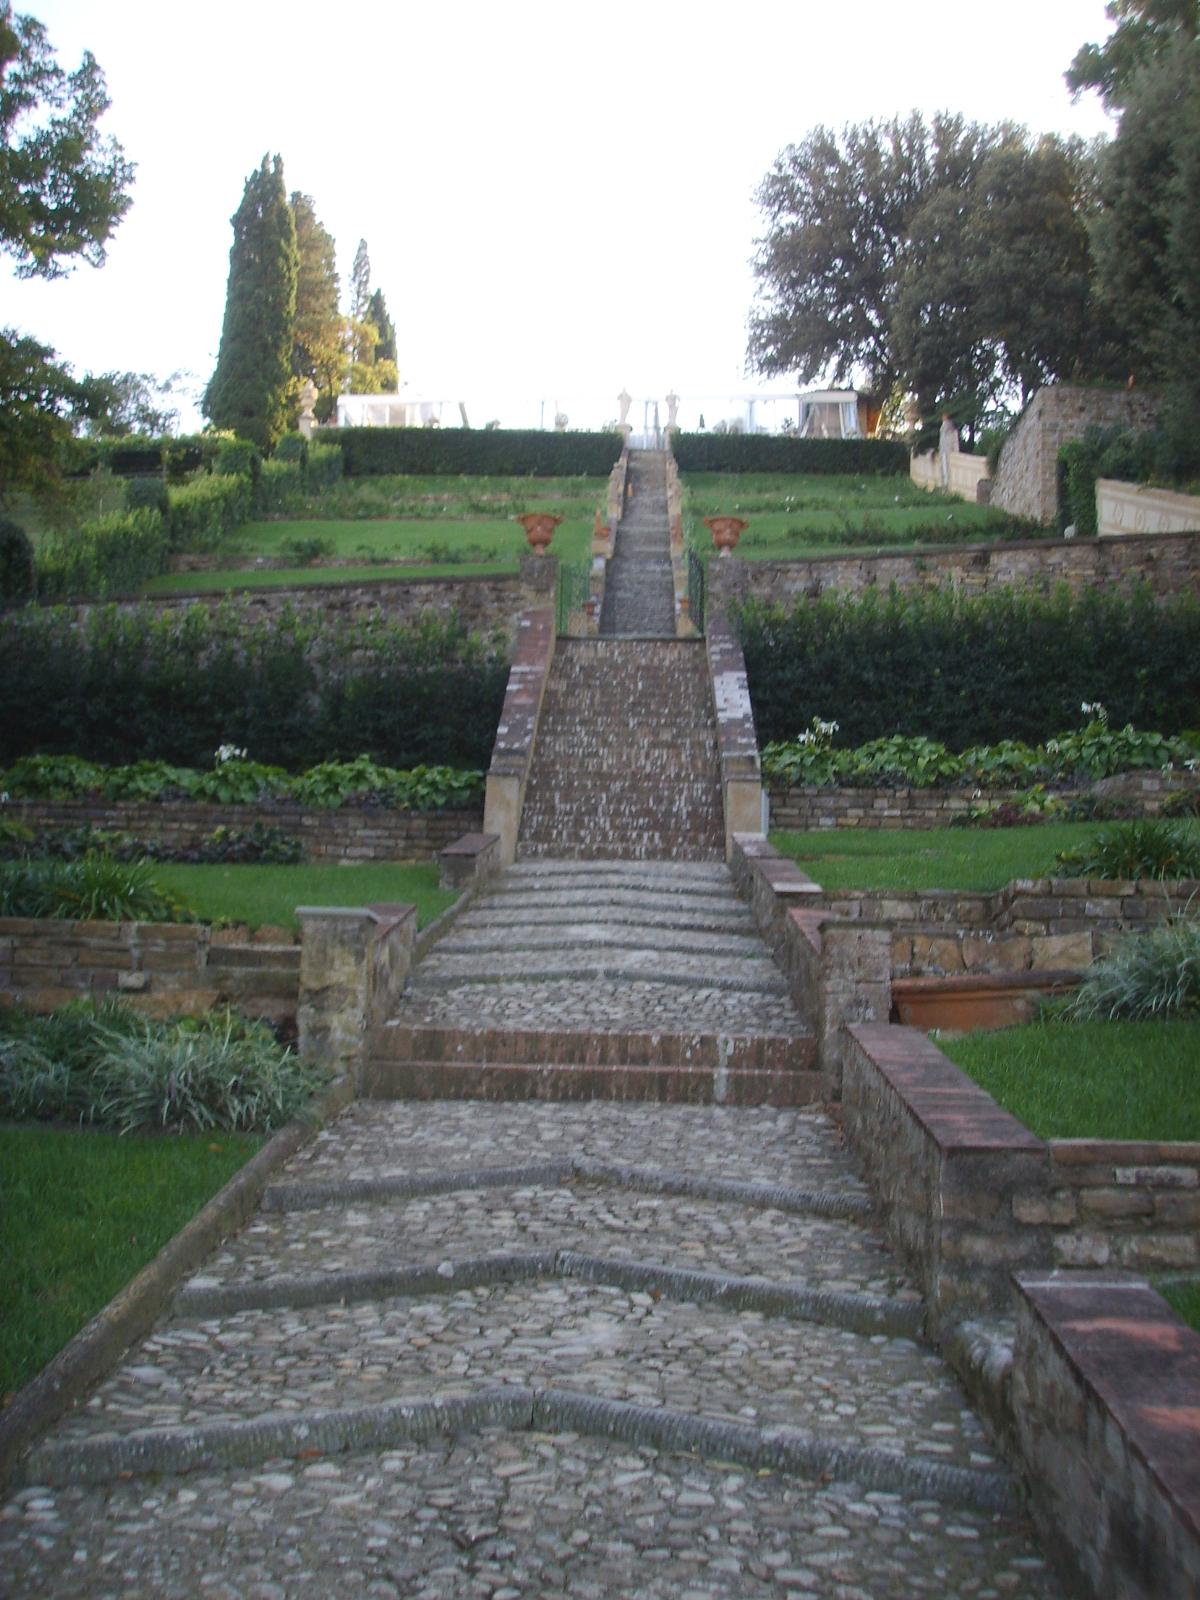 File:Giardino bardini, terrazzamento 06.JPG - Wikimedia Commons